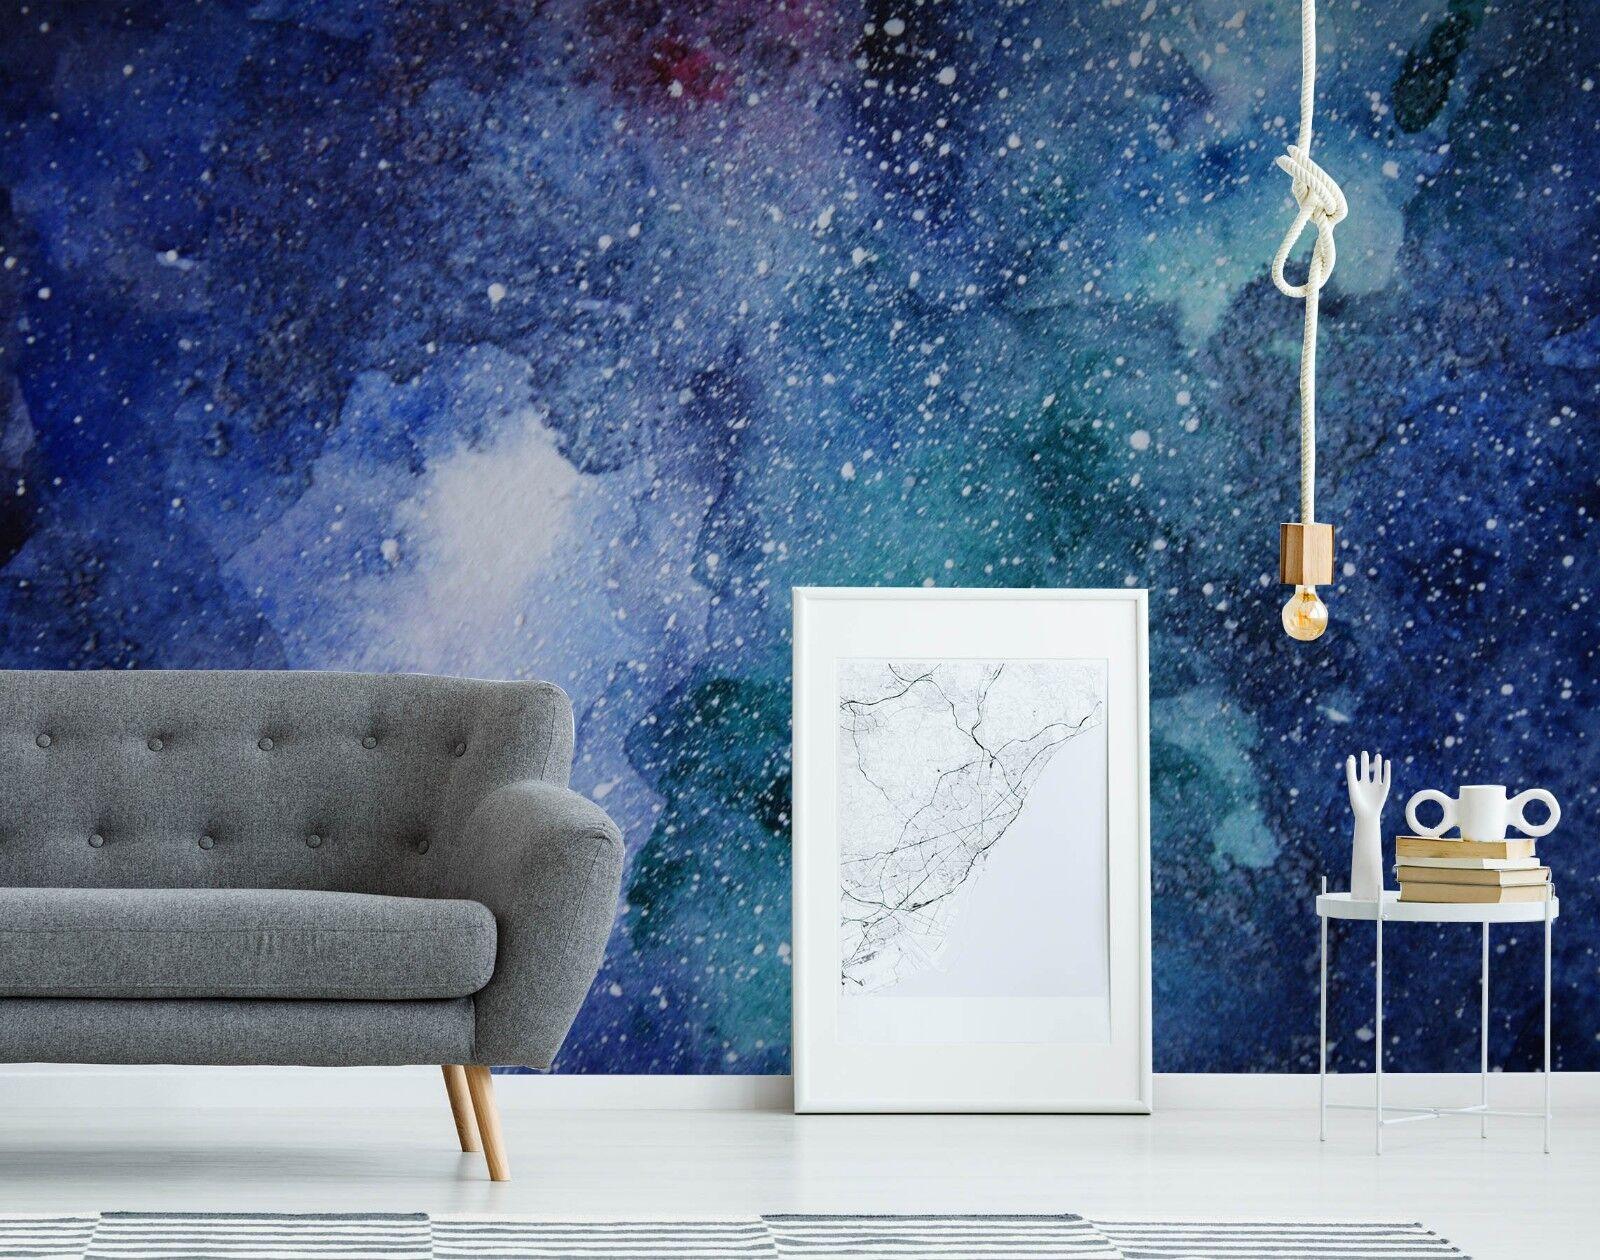 3D Blau Sky Starlight View 336 WallPaper Murals Wall Decal WallPaper AU Carly